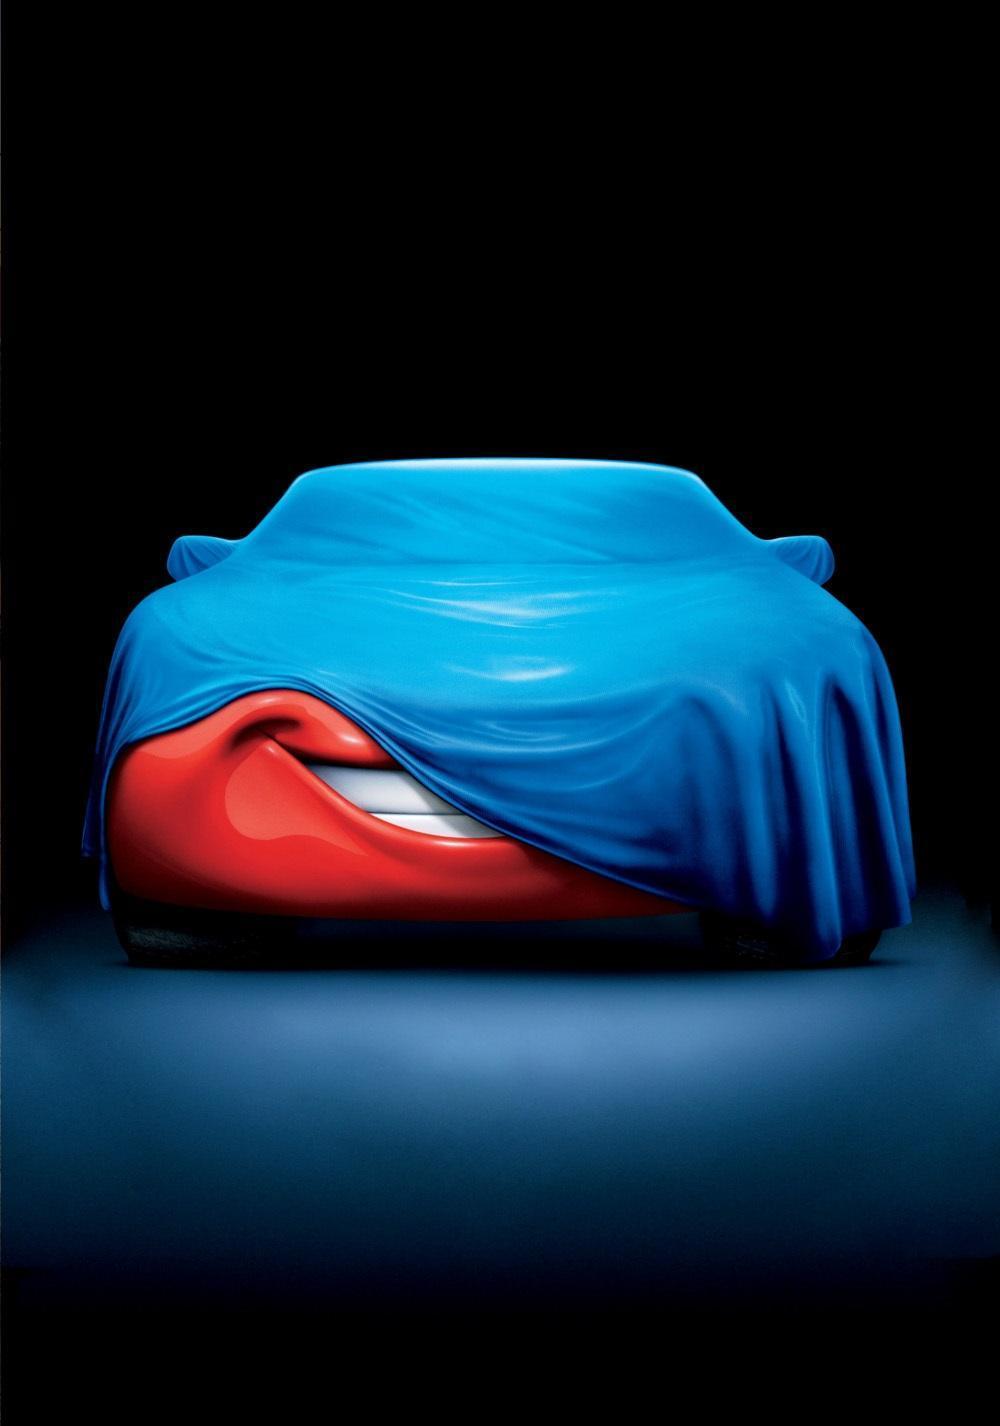 Mcqueen Cars Wallpaper Fur Android Apk Herunterladen